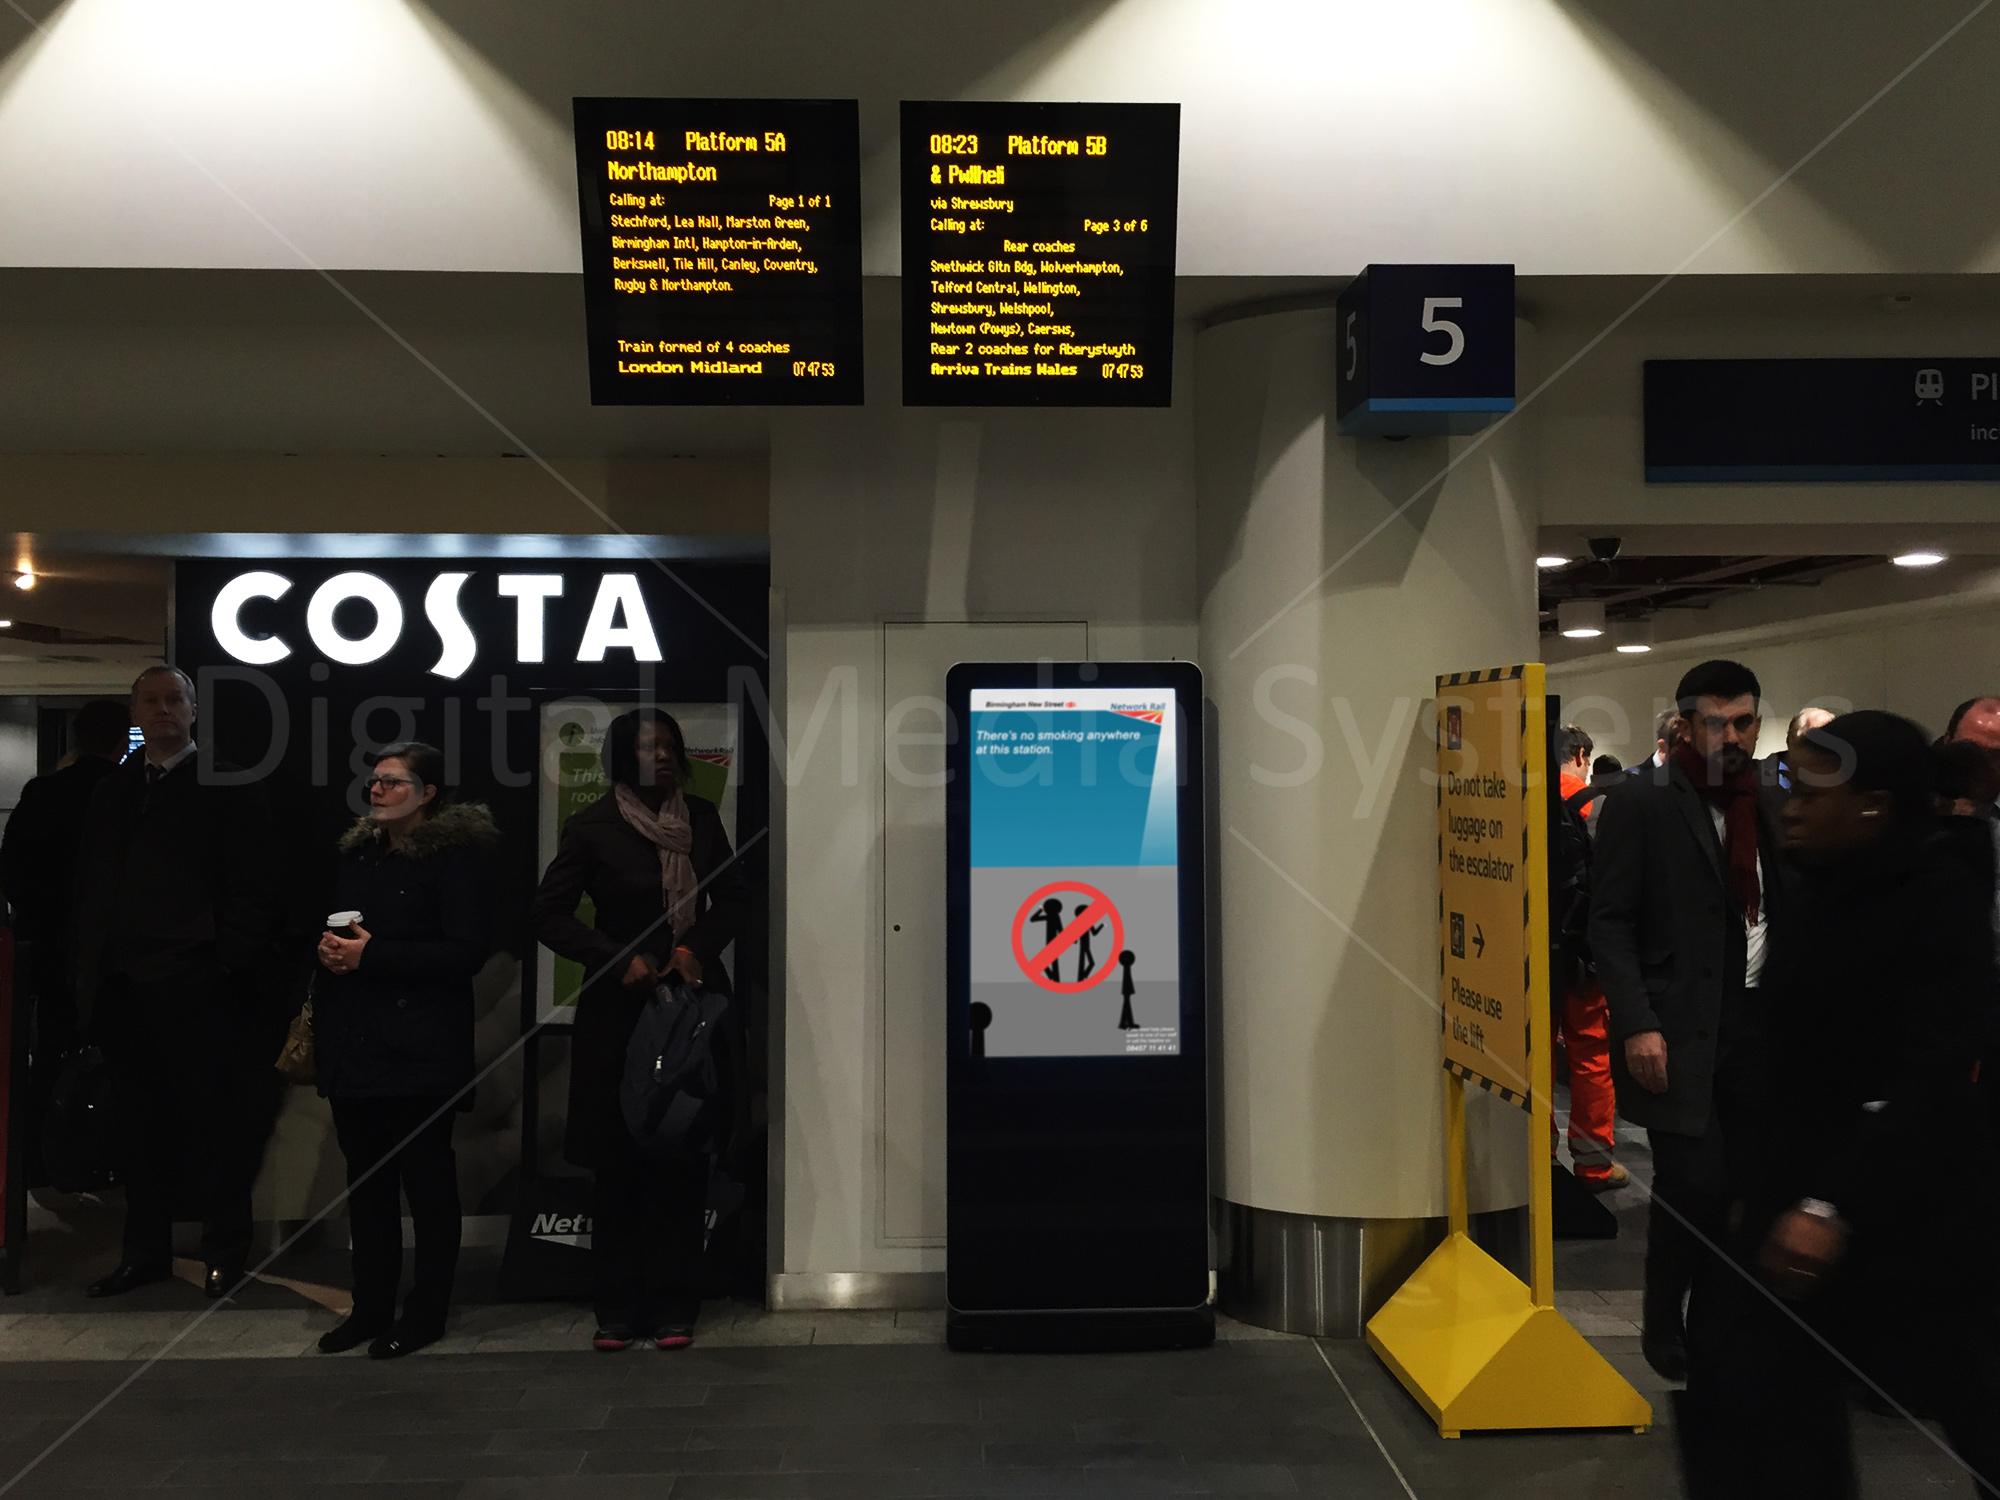 "50"" Digital Notice Board Screen at Birmingham New Street Station"